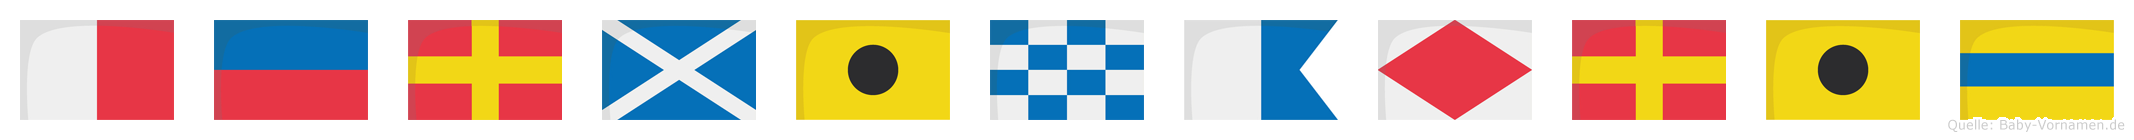 Herminafrid im Flaggenalphabet